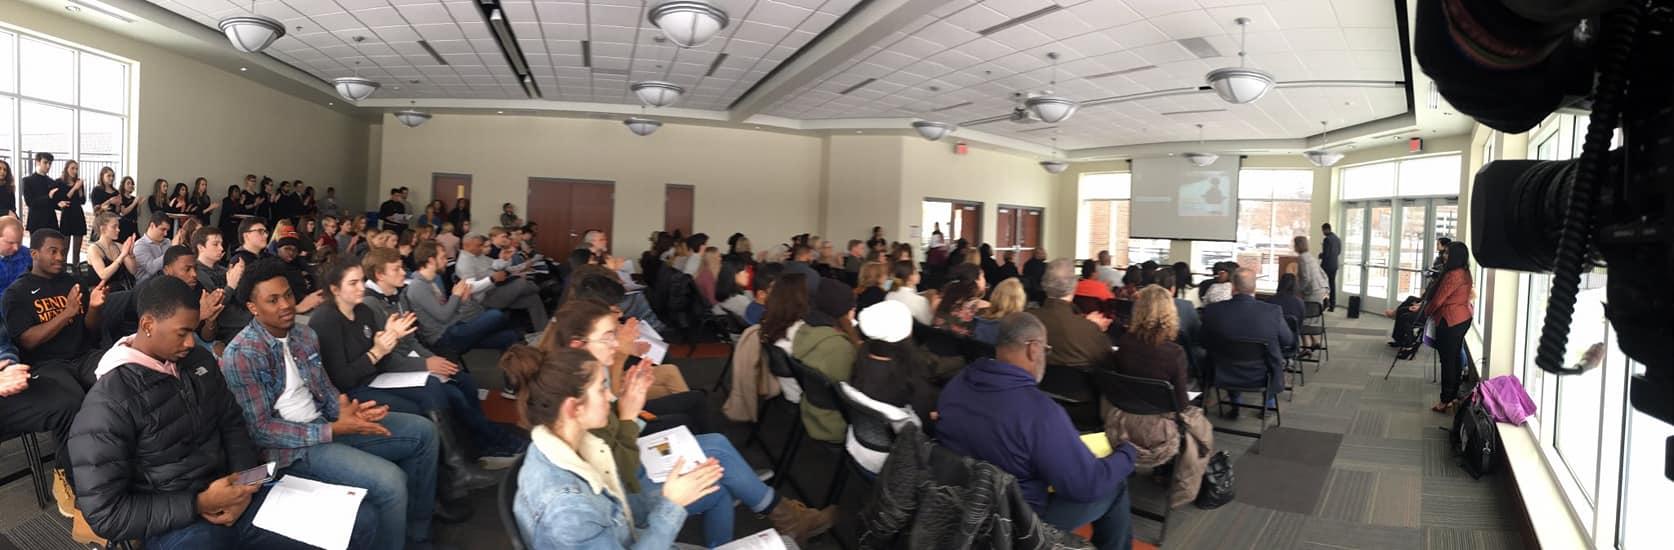 Kalamazoo College Speaking Event